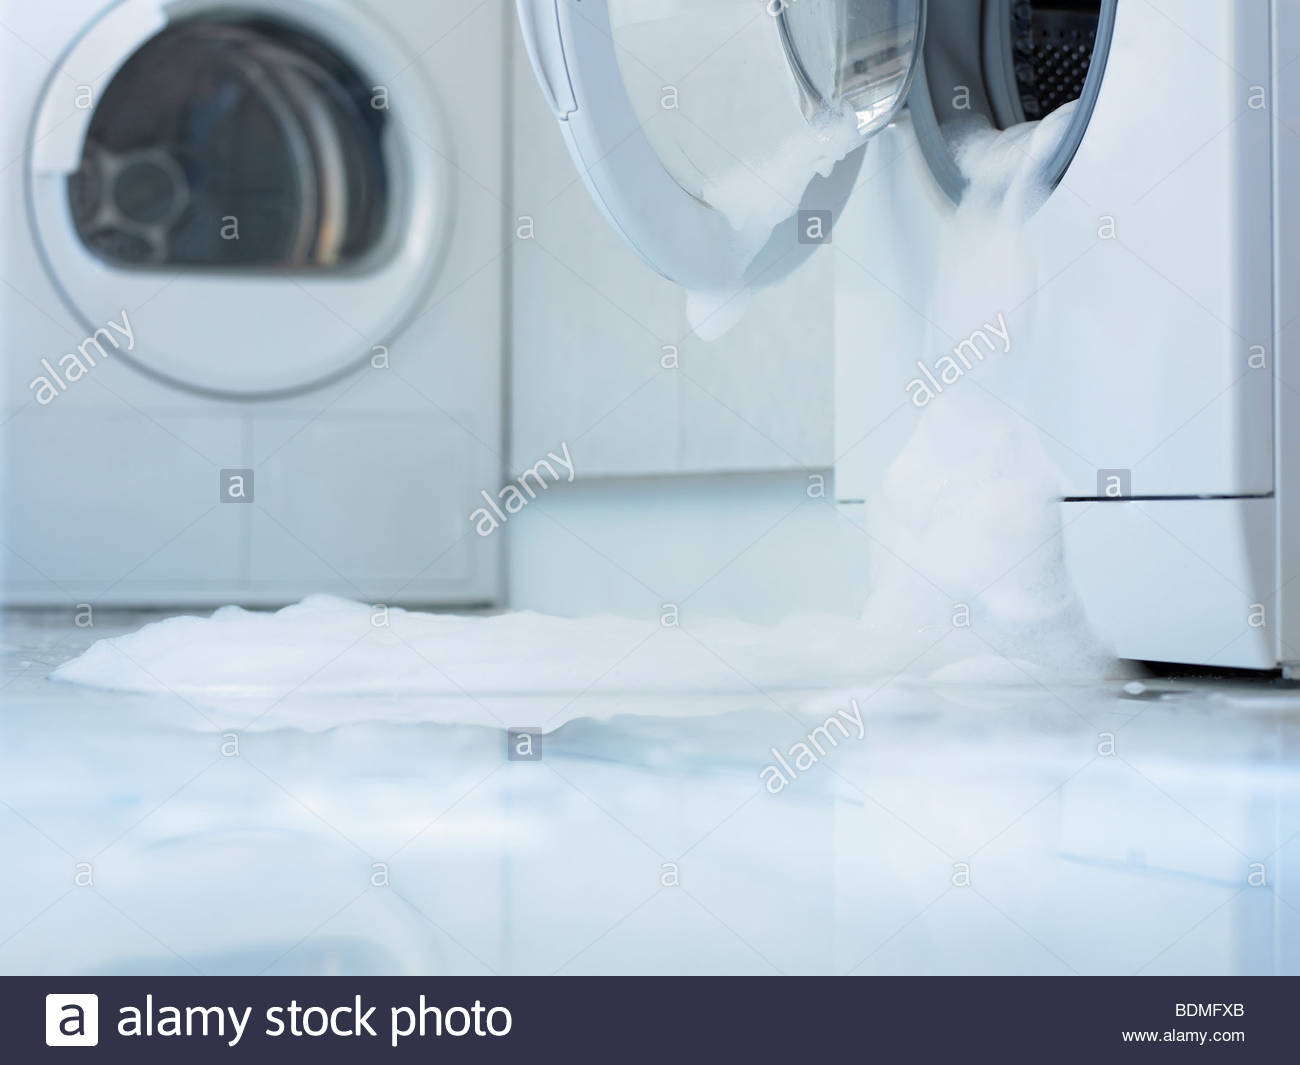 Washing machine overflowing - Stock Image